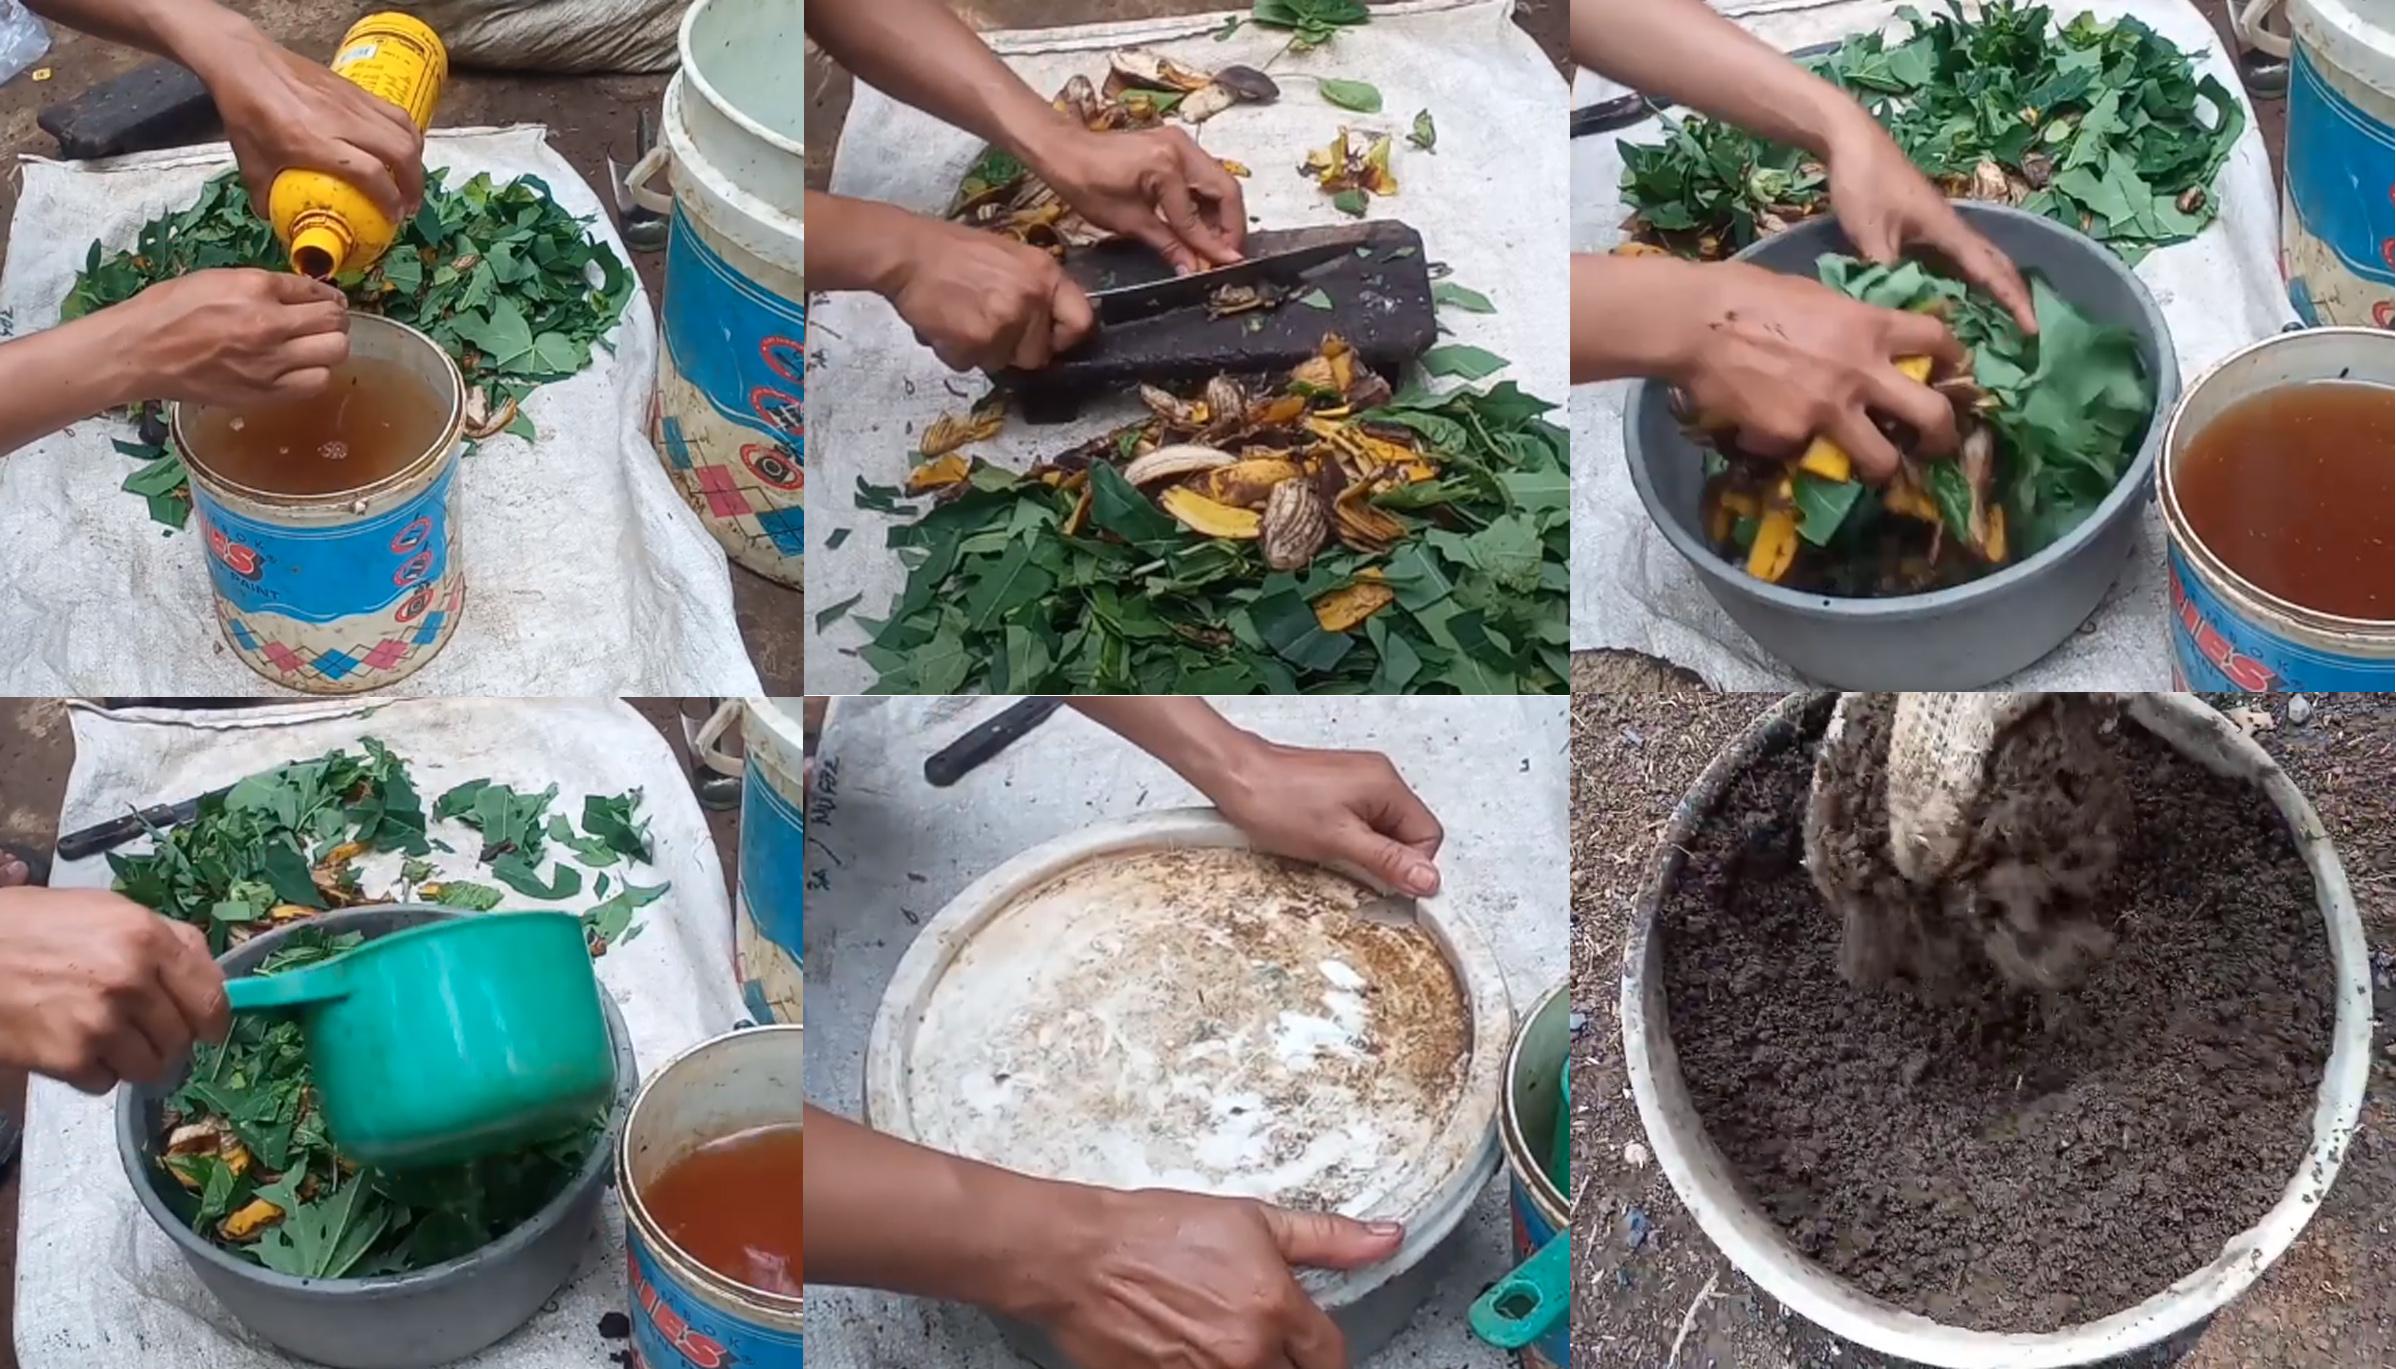 Cara Membuat Pupuk Kompos Dari Sampah Rumah Tangga Kampustani Com